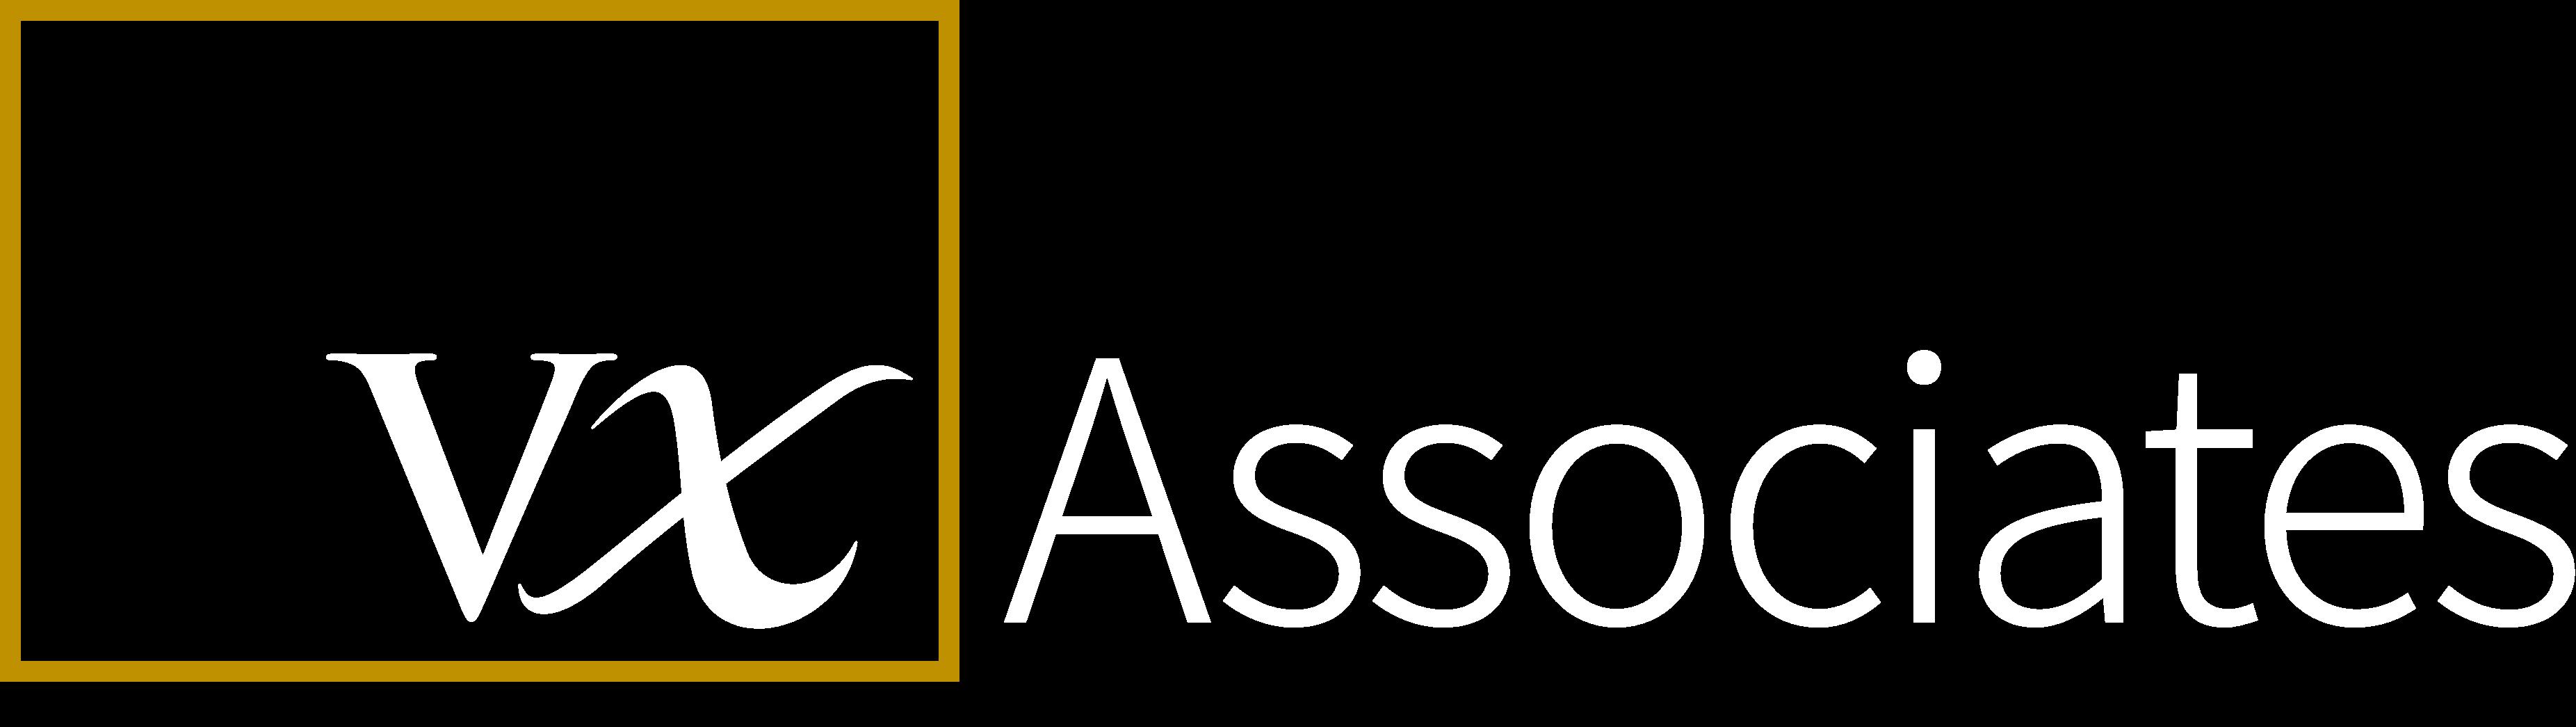 VX Associates white logo